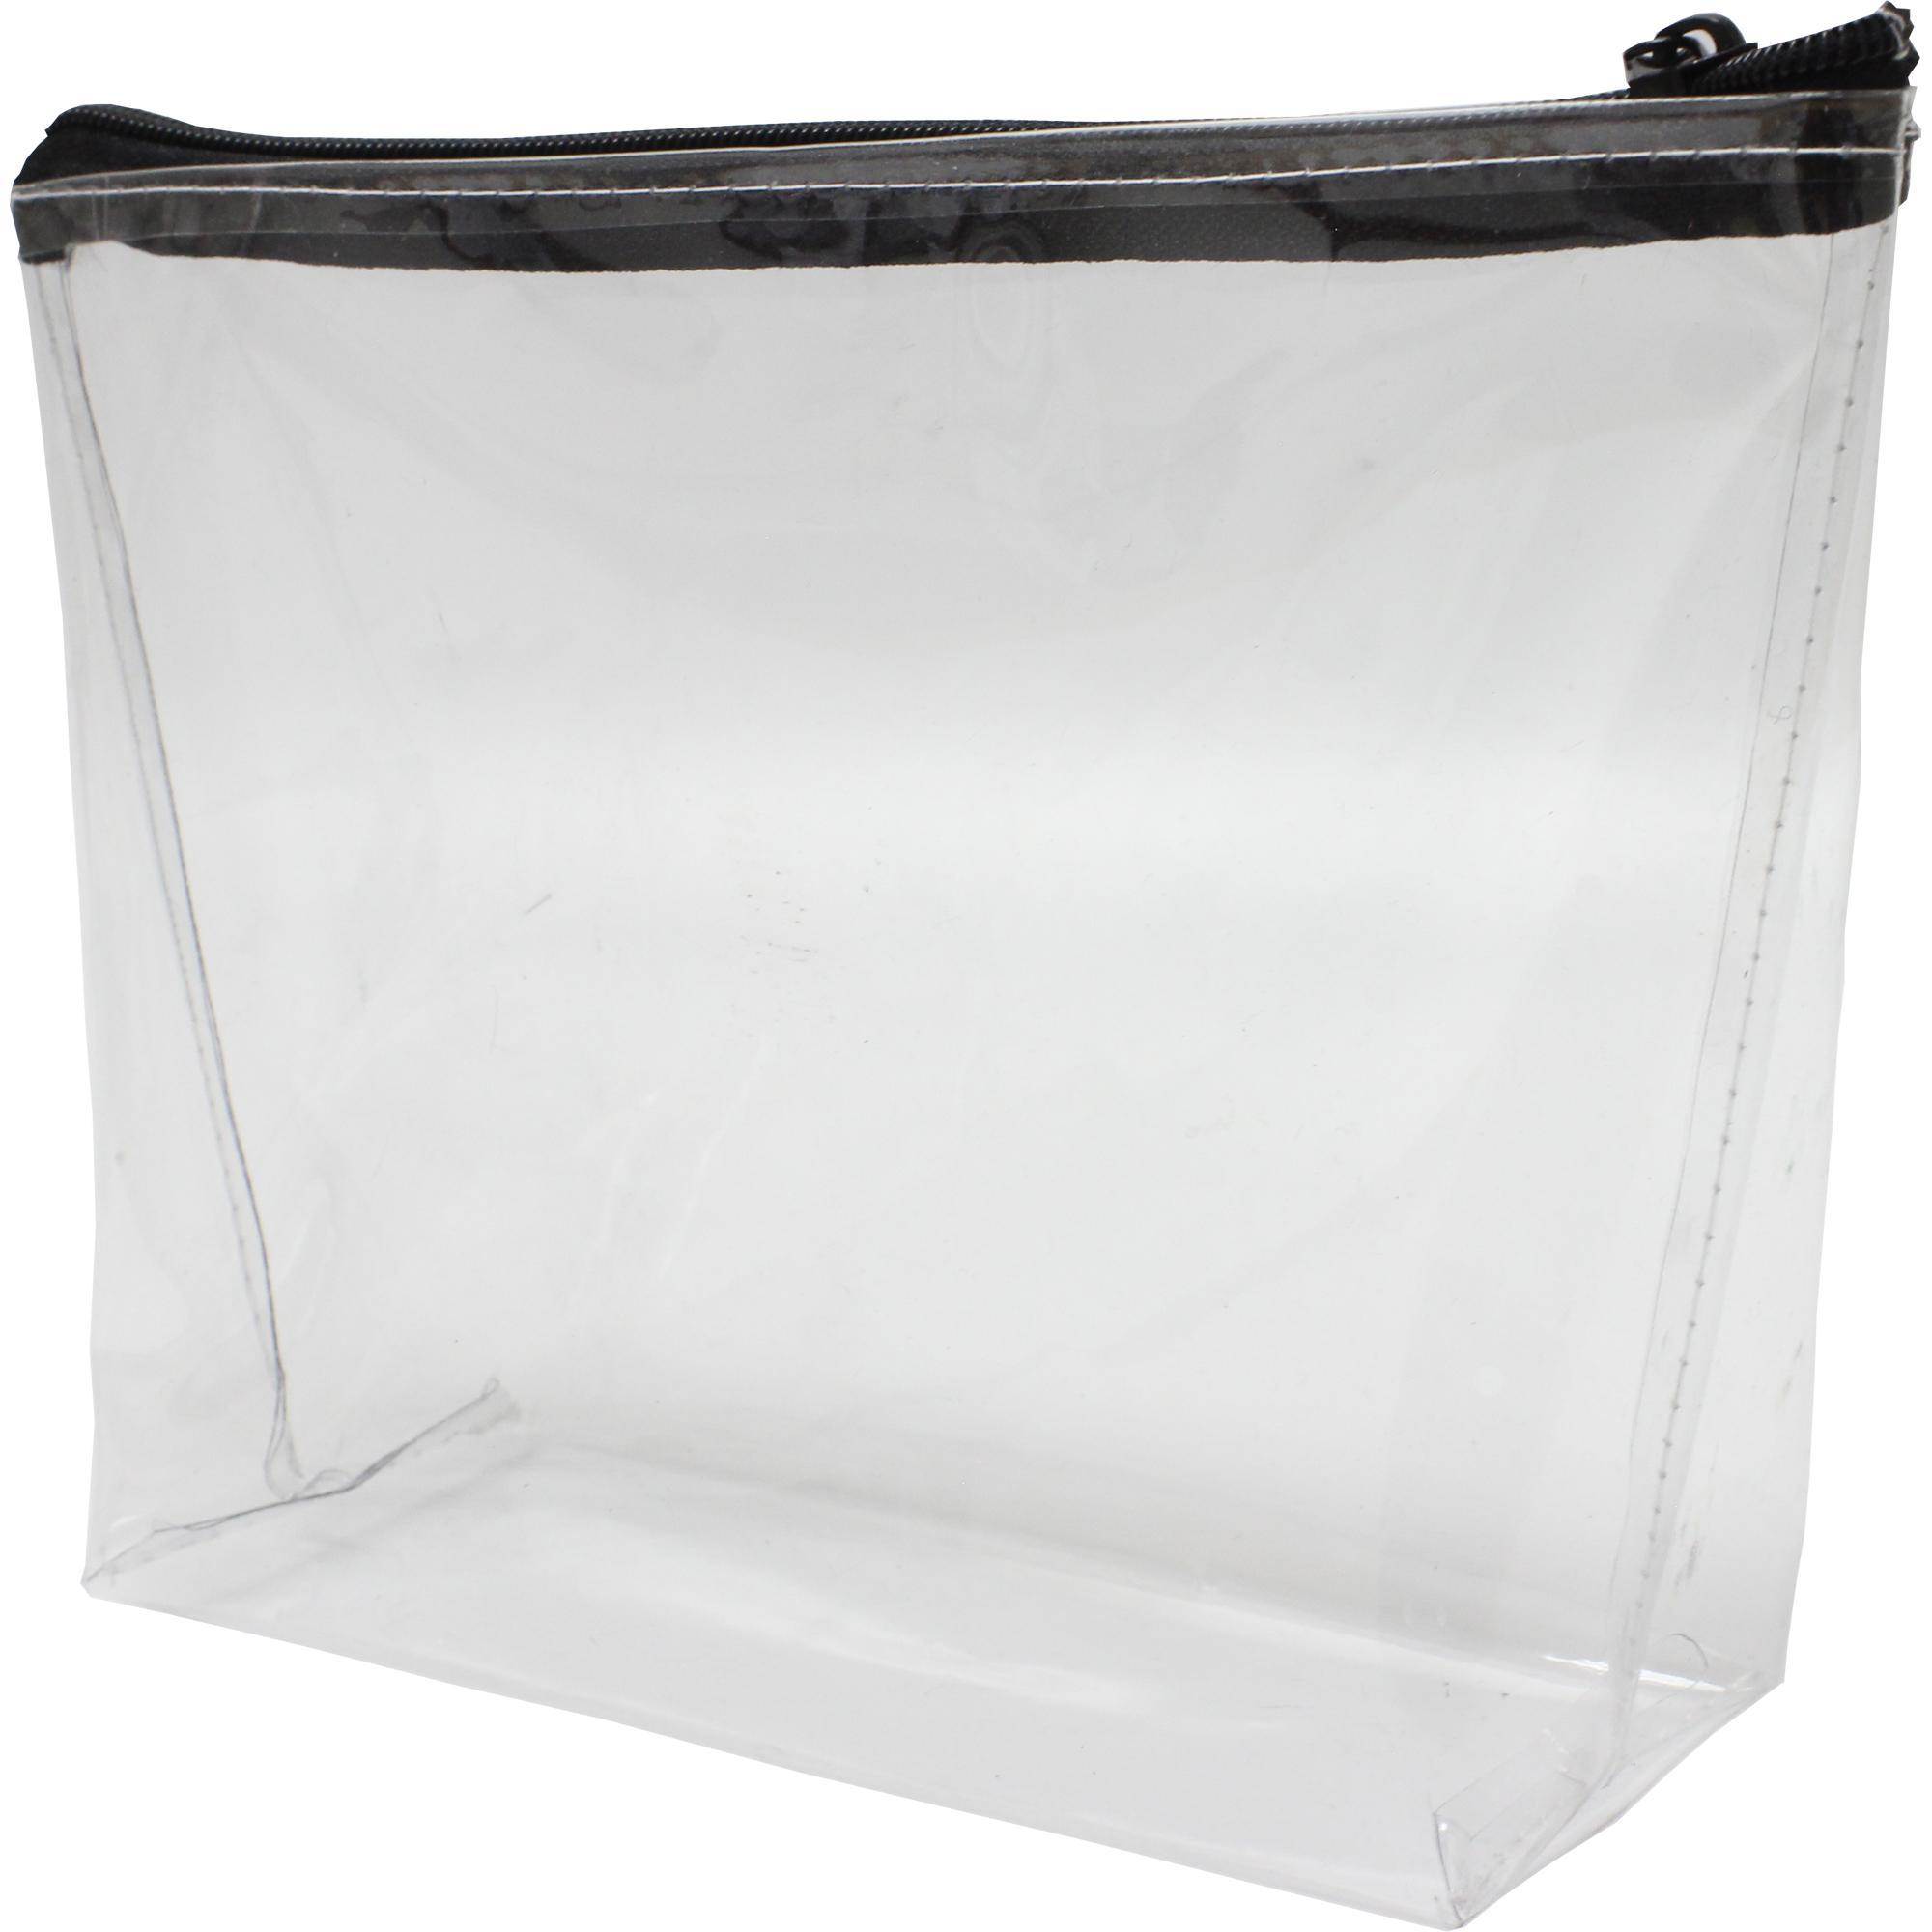 Adeja Pvc Cosmetic Bag With 1 Col Screen Print